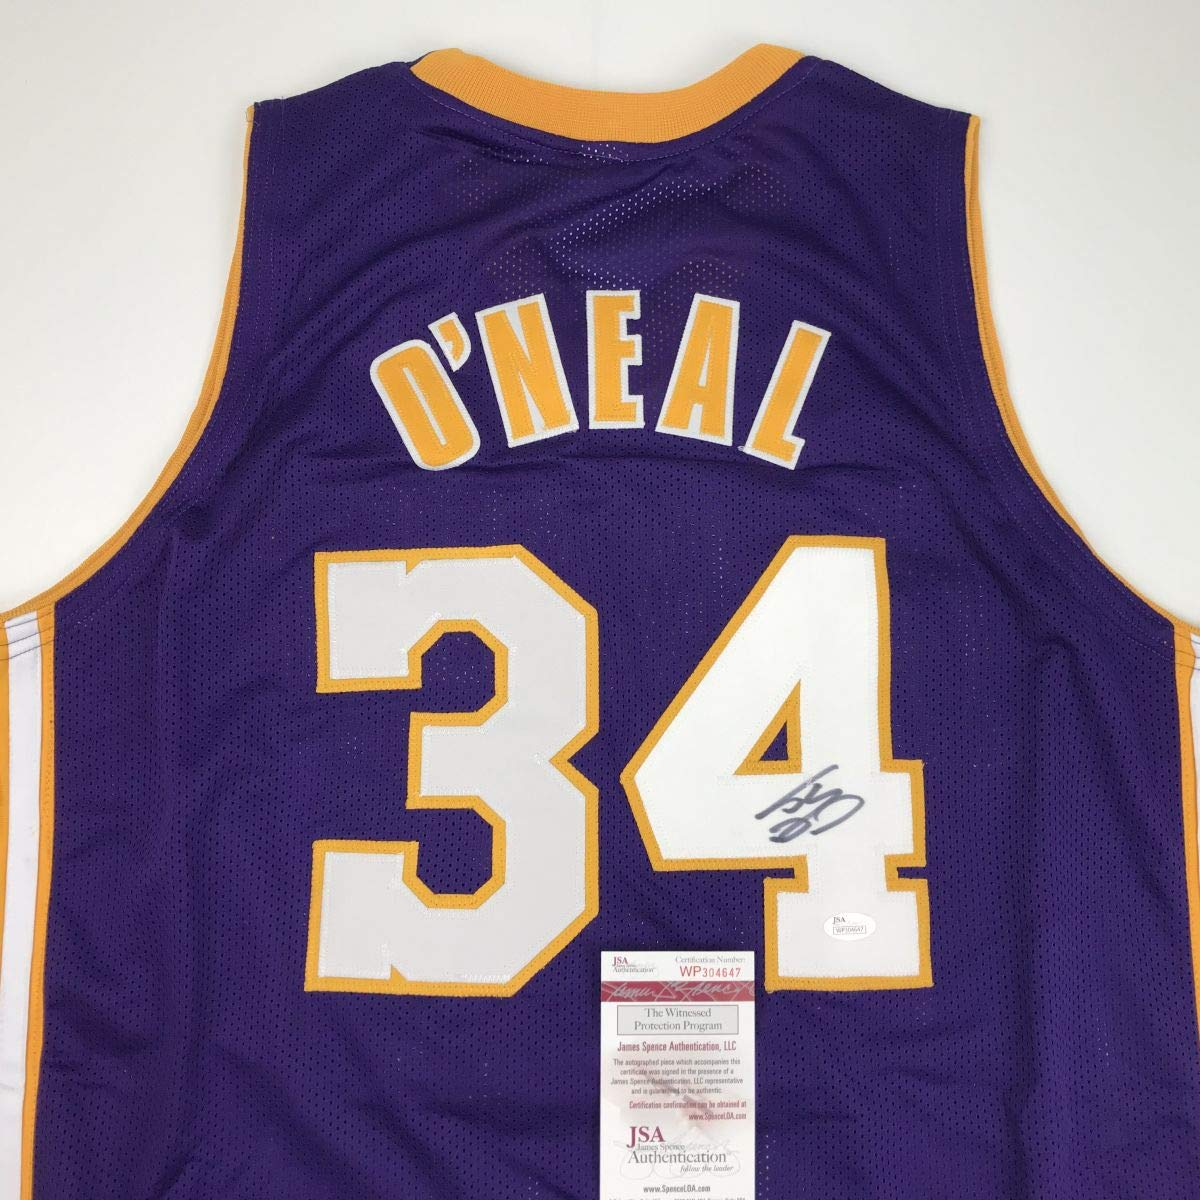 reputable site fe03b f10a9 Autographed/Signed Shaquille Shaq O'Neal Los Angeles LA Purple Basketball  Jersey JSA COA